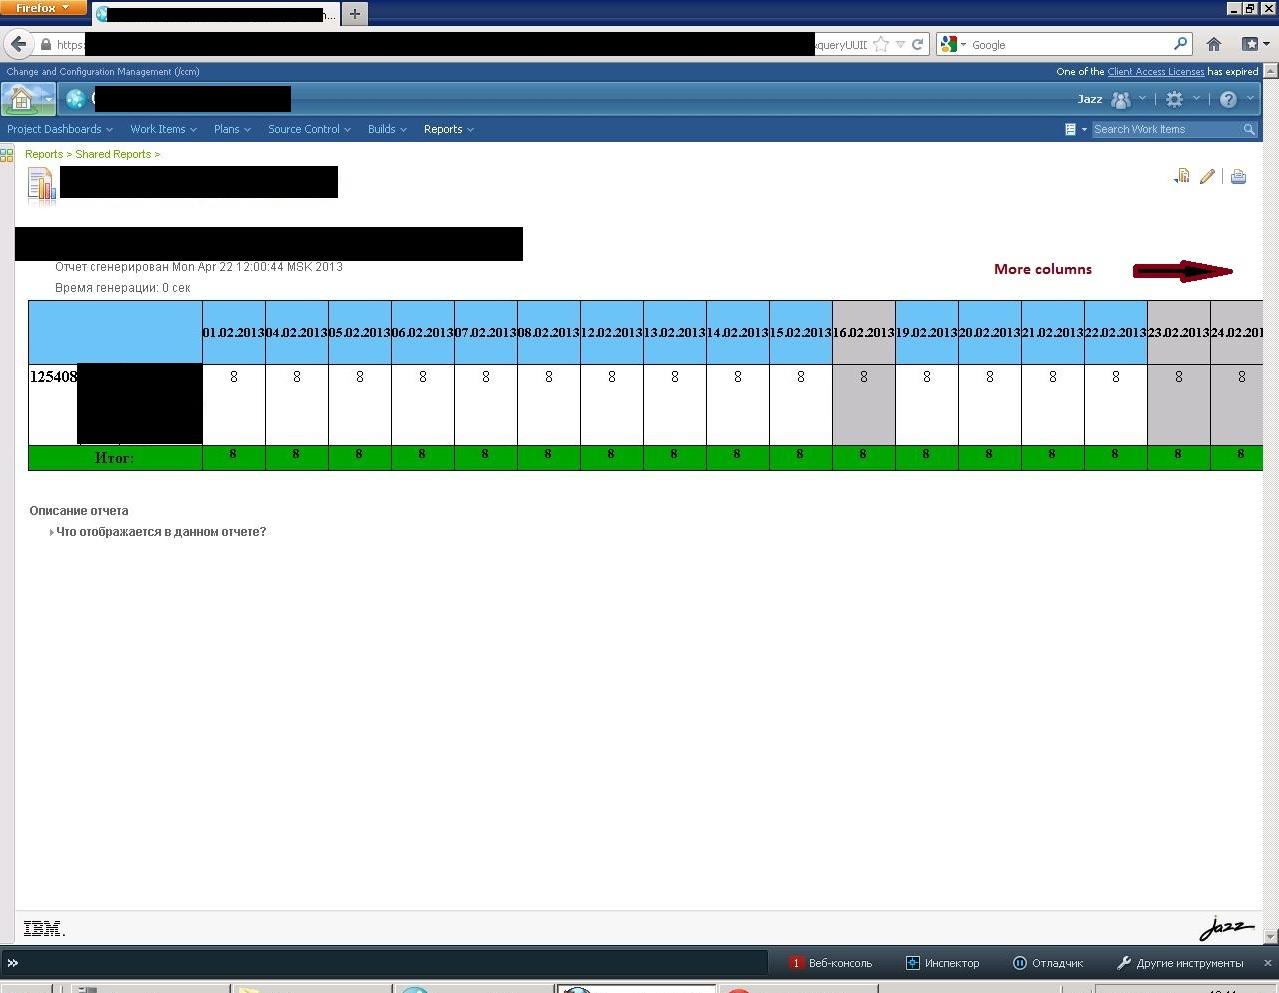 Missing horizontal scroll bar in custom BIRT report - Jazz Forum